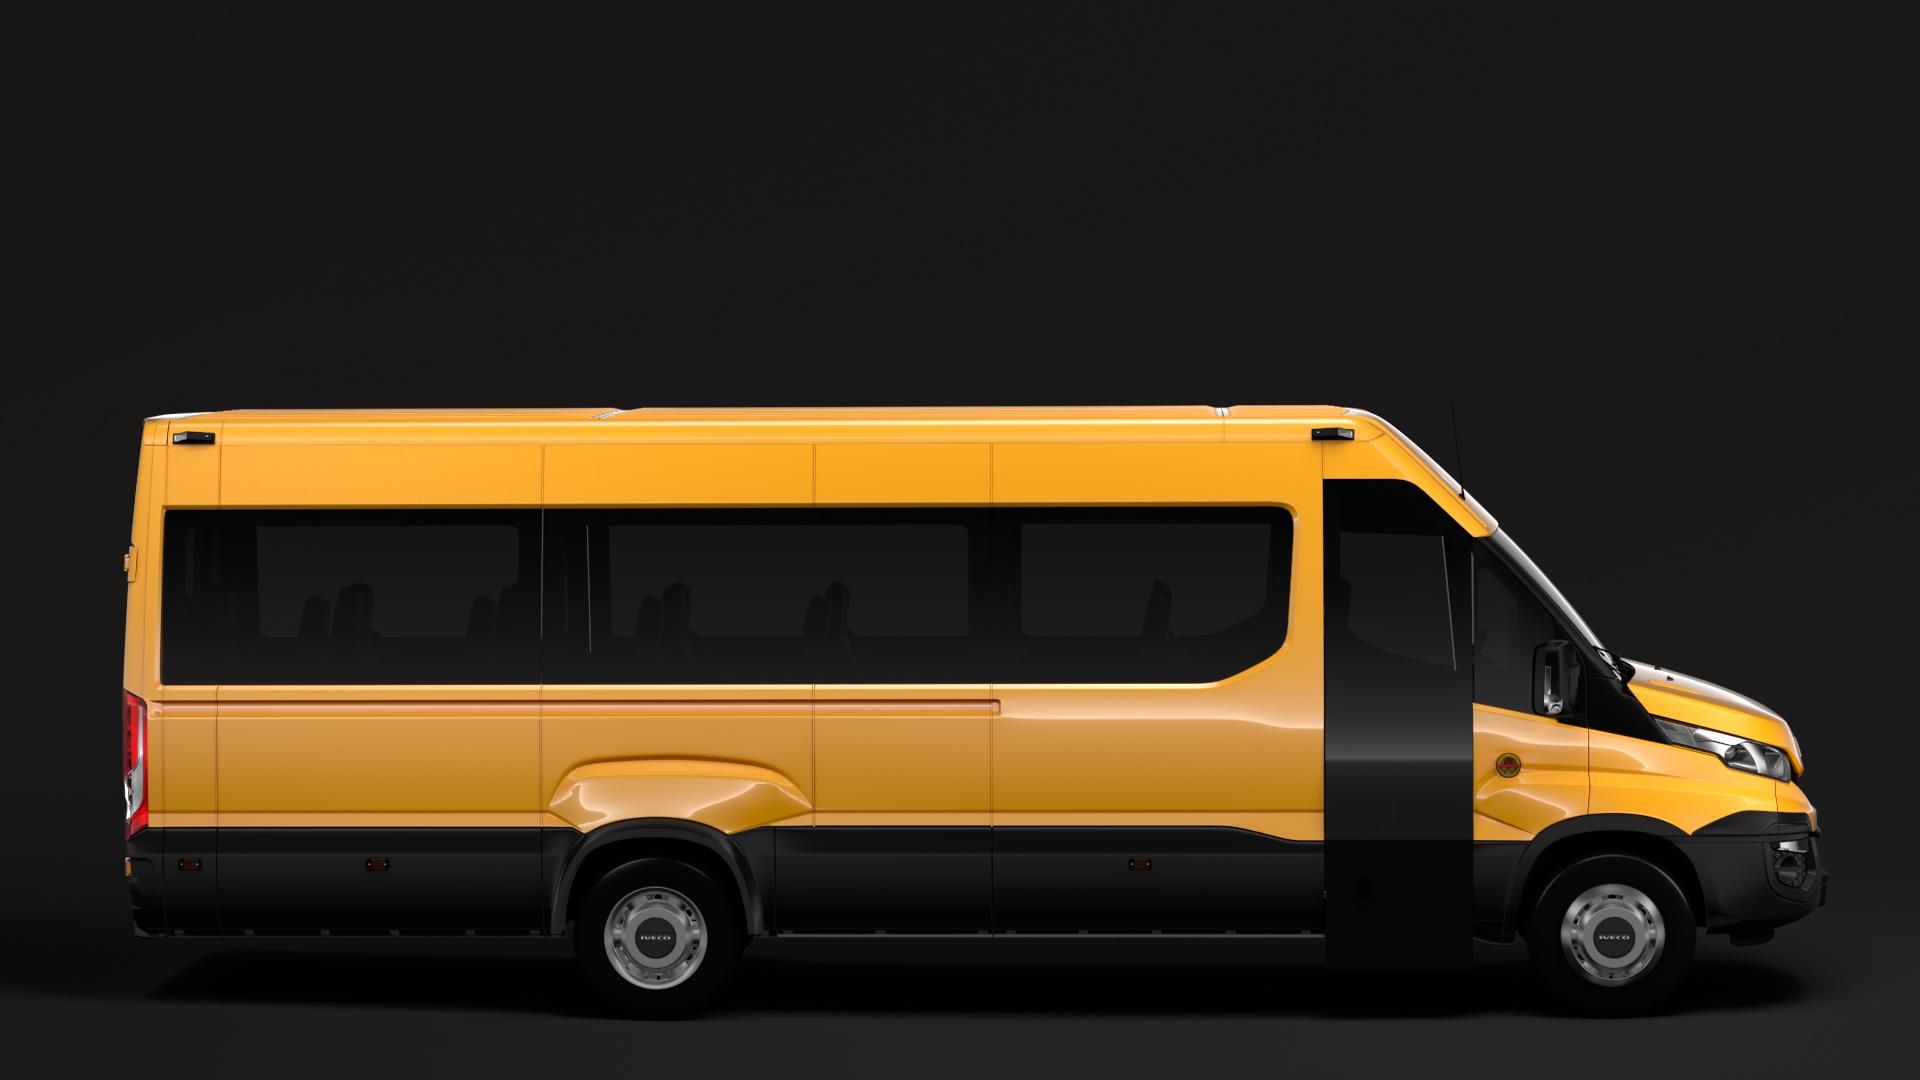 iveco daily tourus l5h2 2014 2016 3d model max fbx c4d lwo ma mb hrc xsi obj 275804